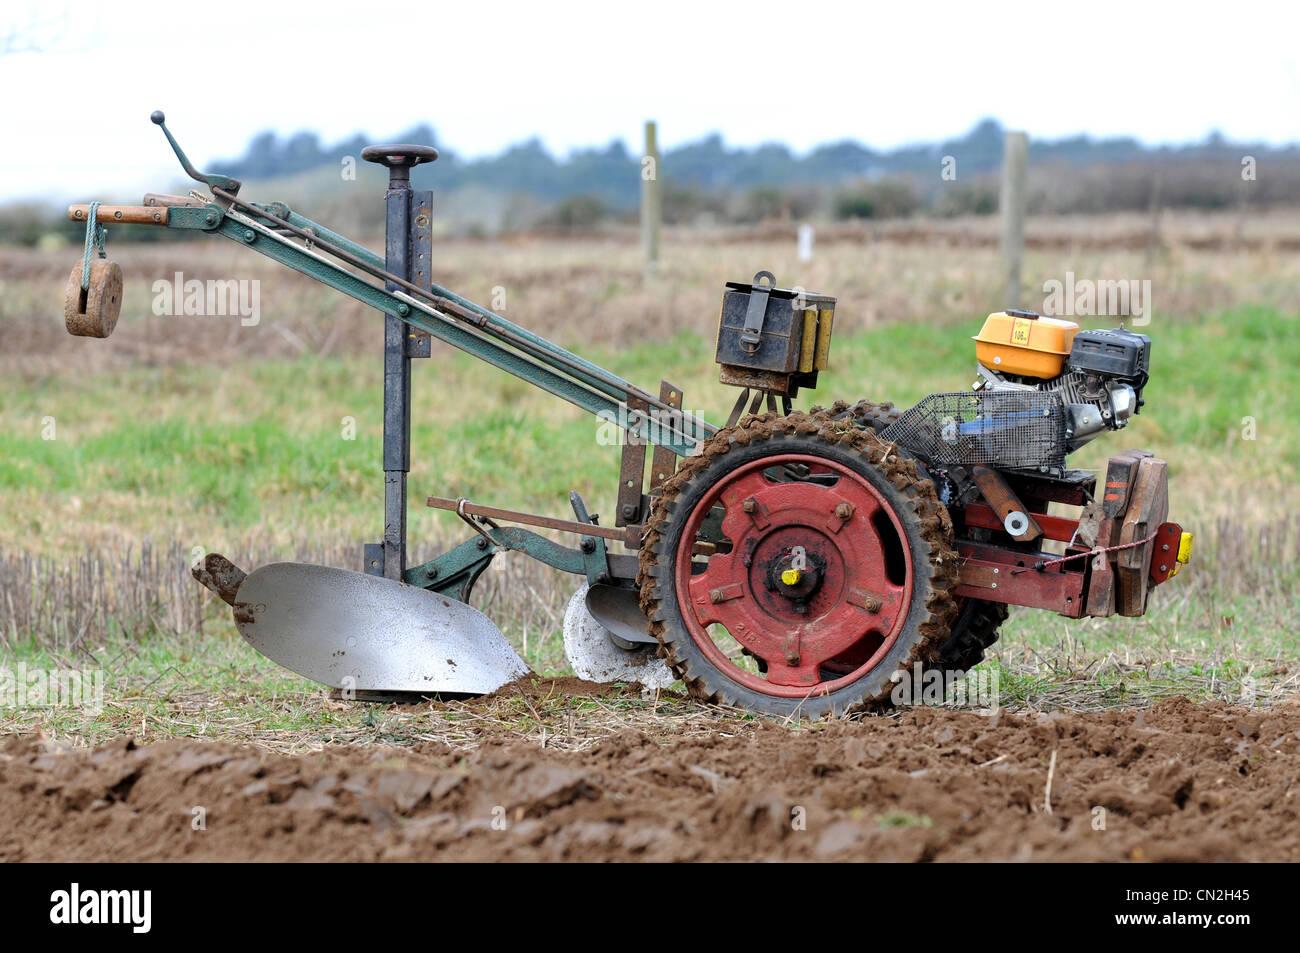 2 Wheel Tractor 1900 : Walking tractor two wheel ploughing plough